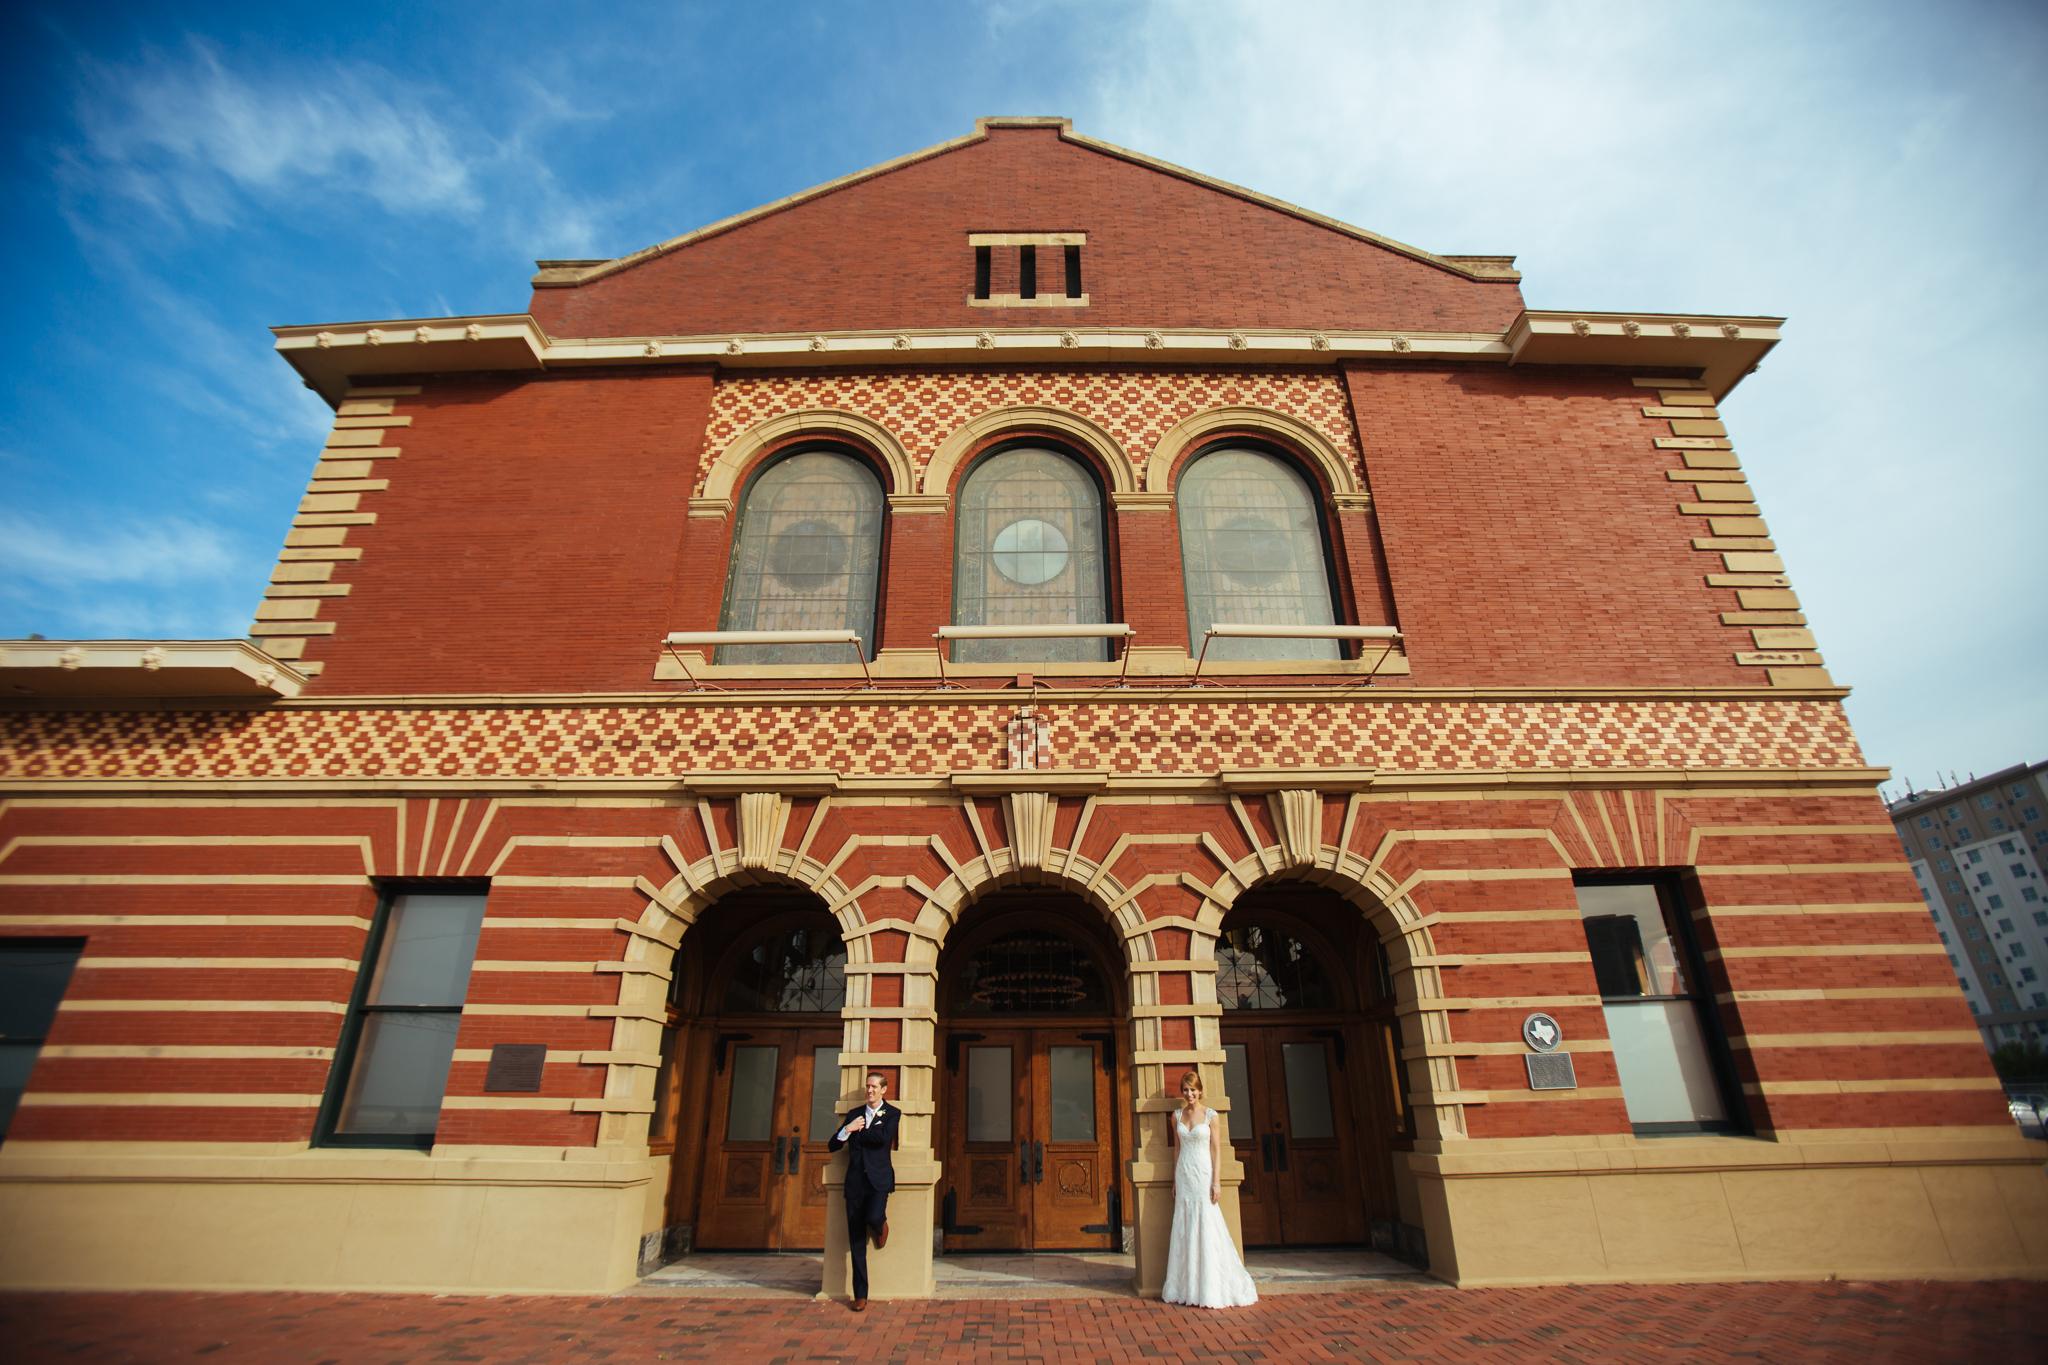 Michael and Kelly - the ashton depot - wedding DFW - wedding photographer- elizalde photography (76 of 150).jpg